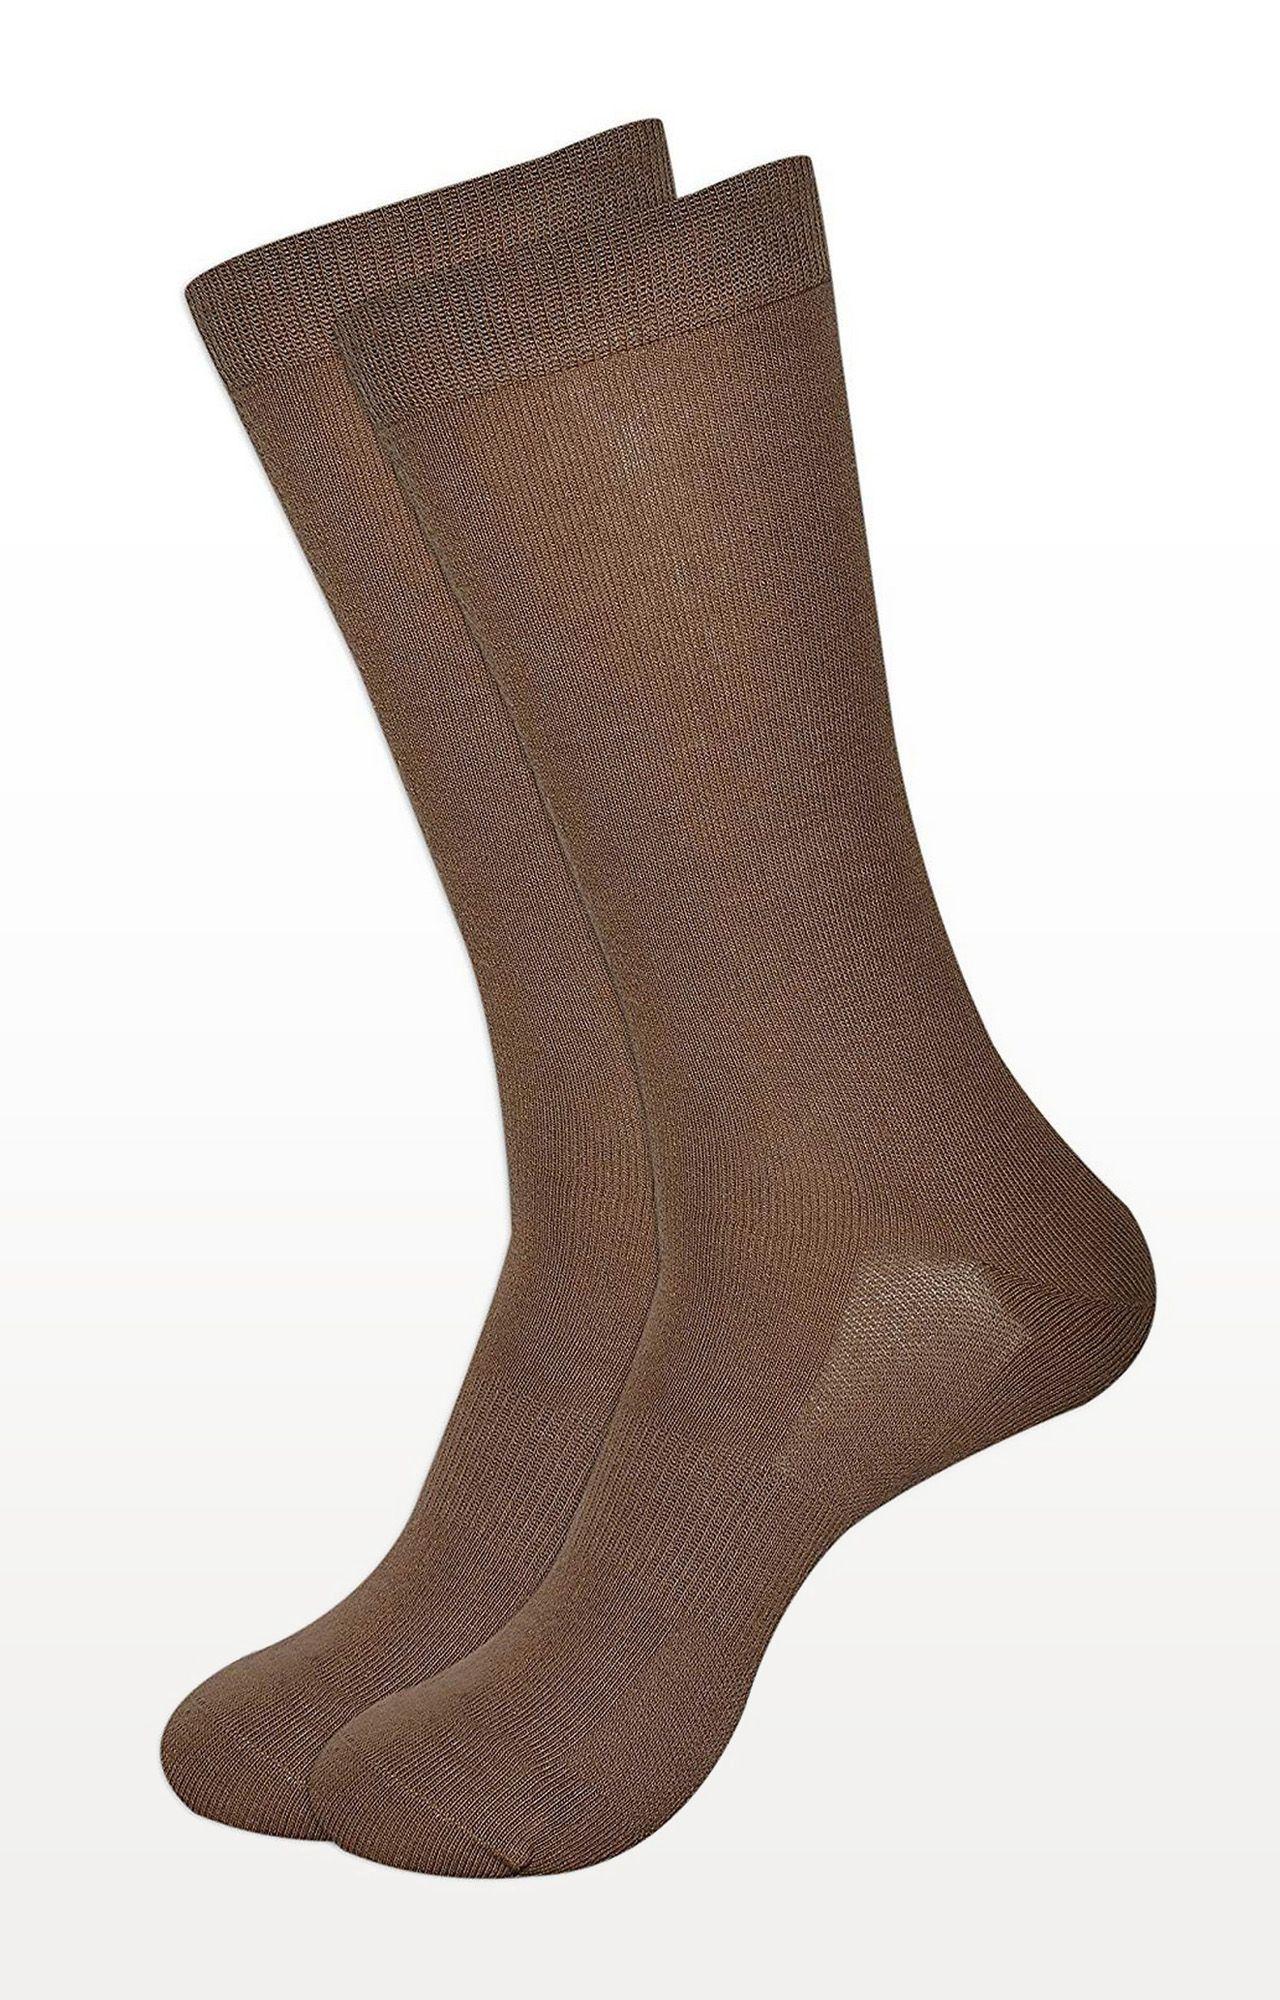 BALENZIA   Brown Solid Socks - Pack of 2